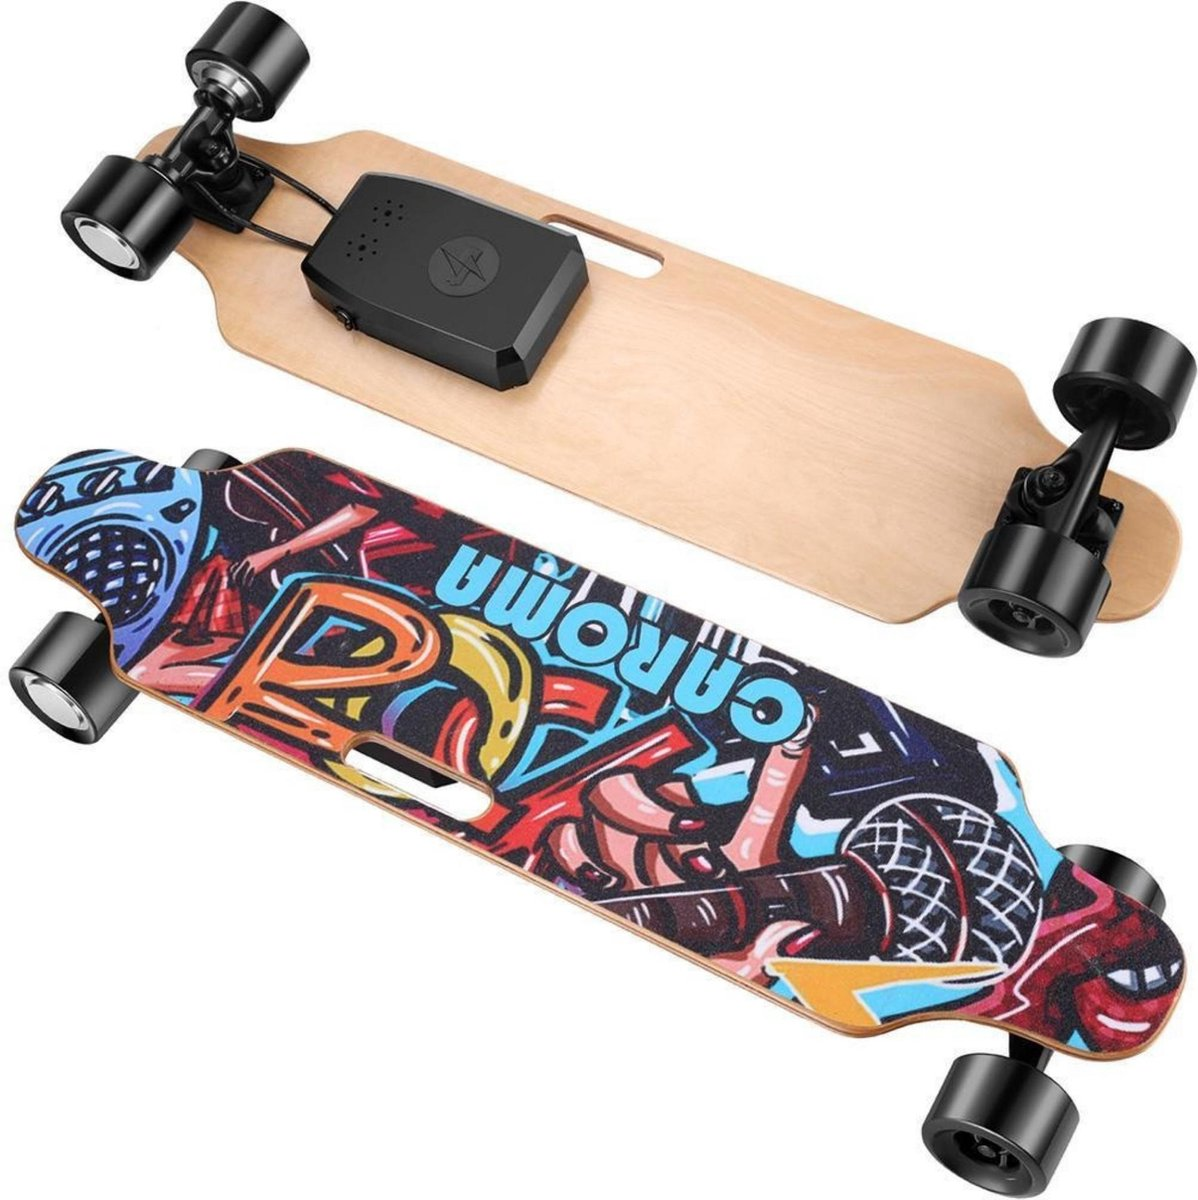 Elektrisch Longboard - Elektrisch Skateboard - Inclusief Controller - 25 km/u - 13km Bereik